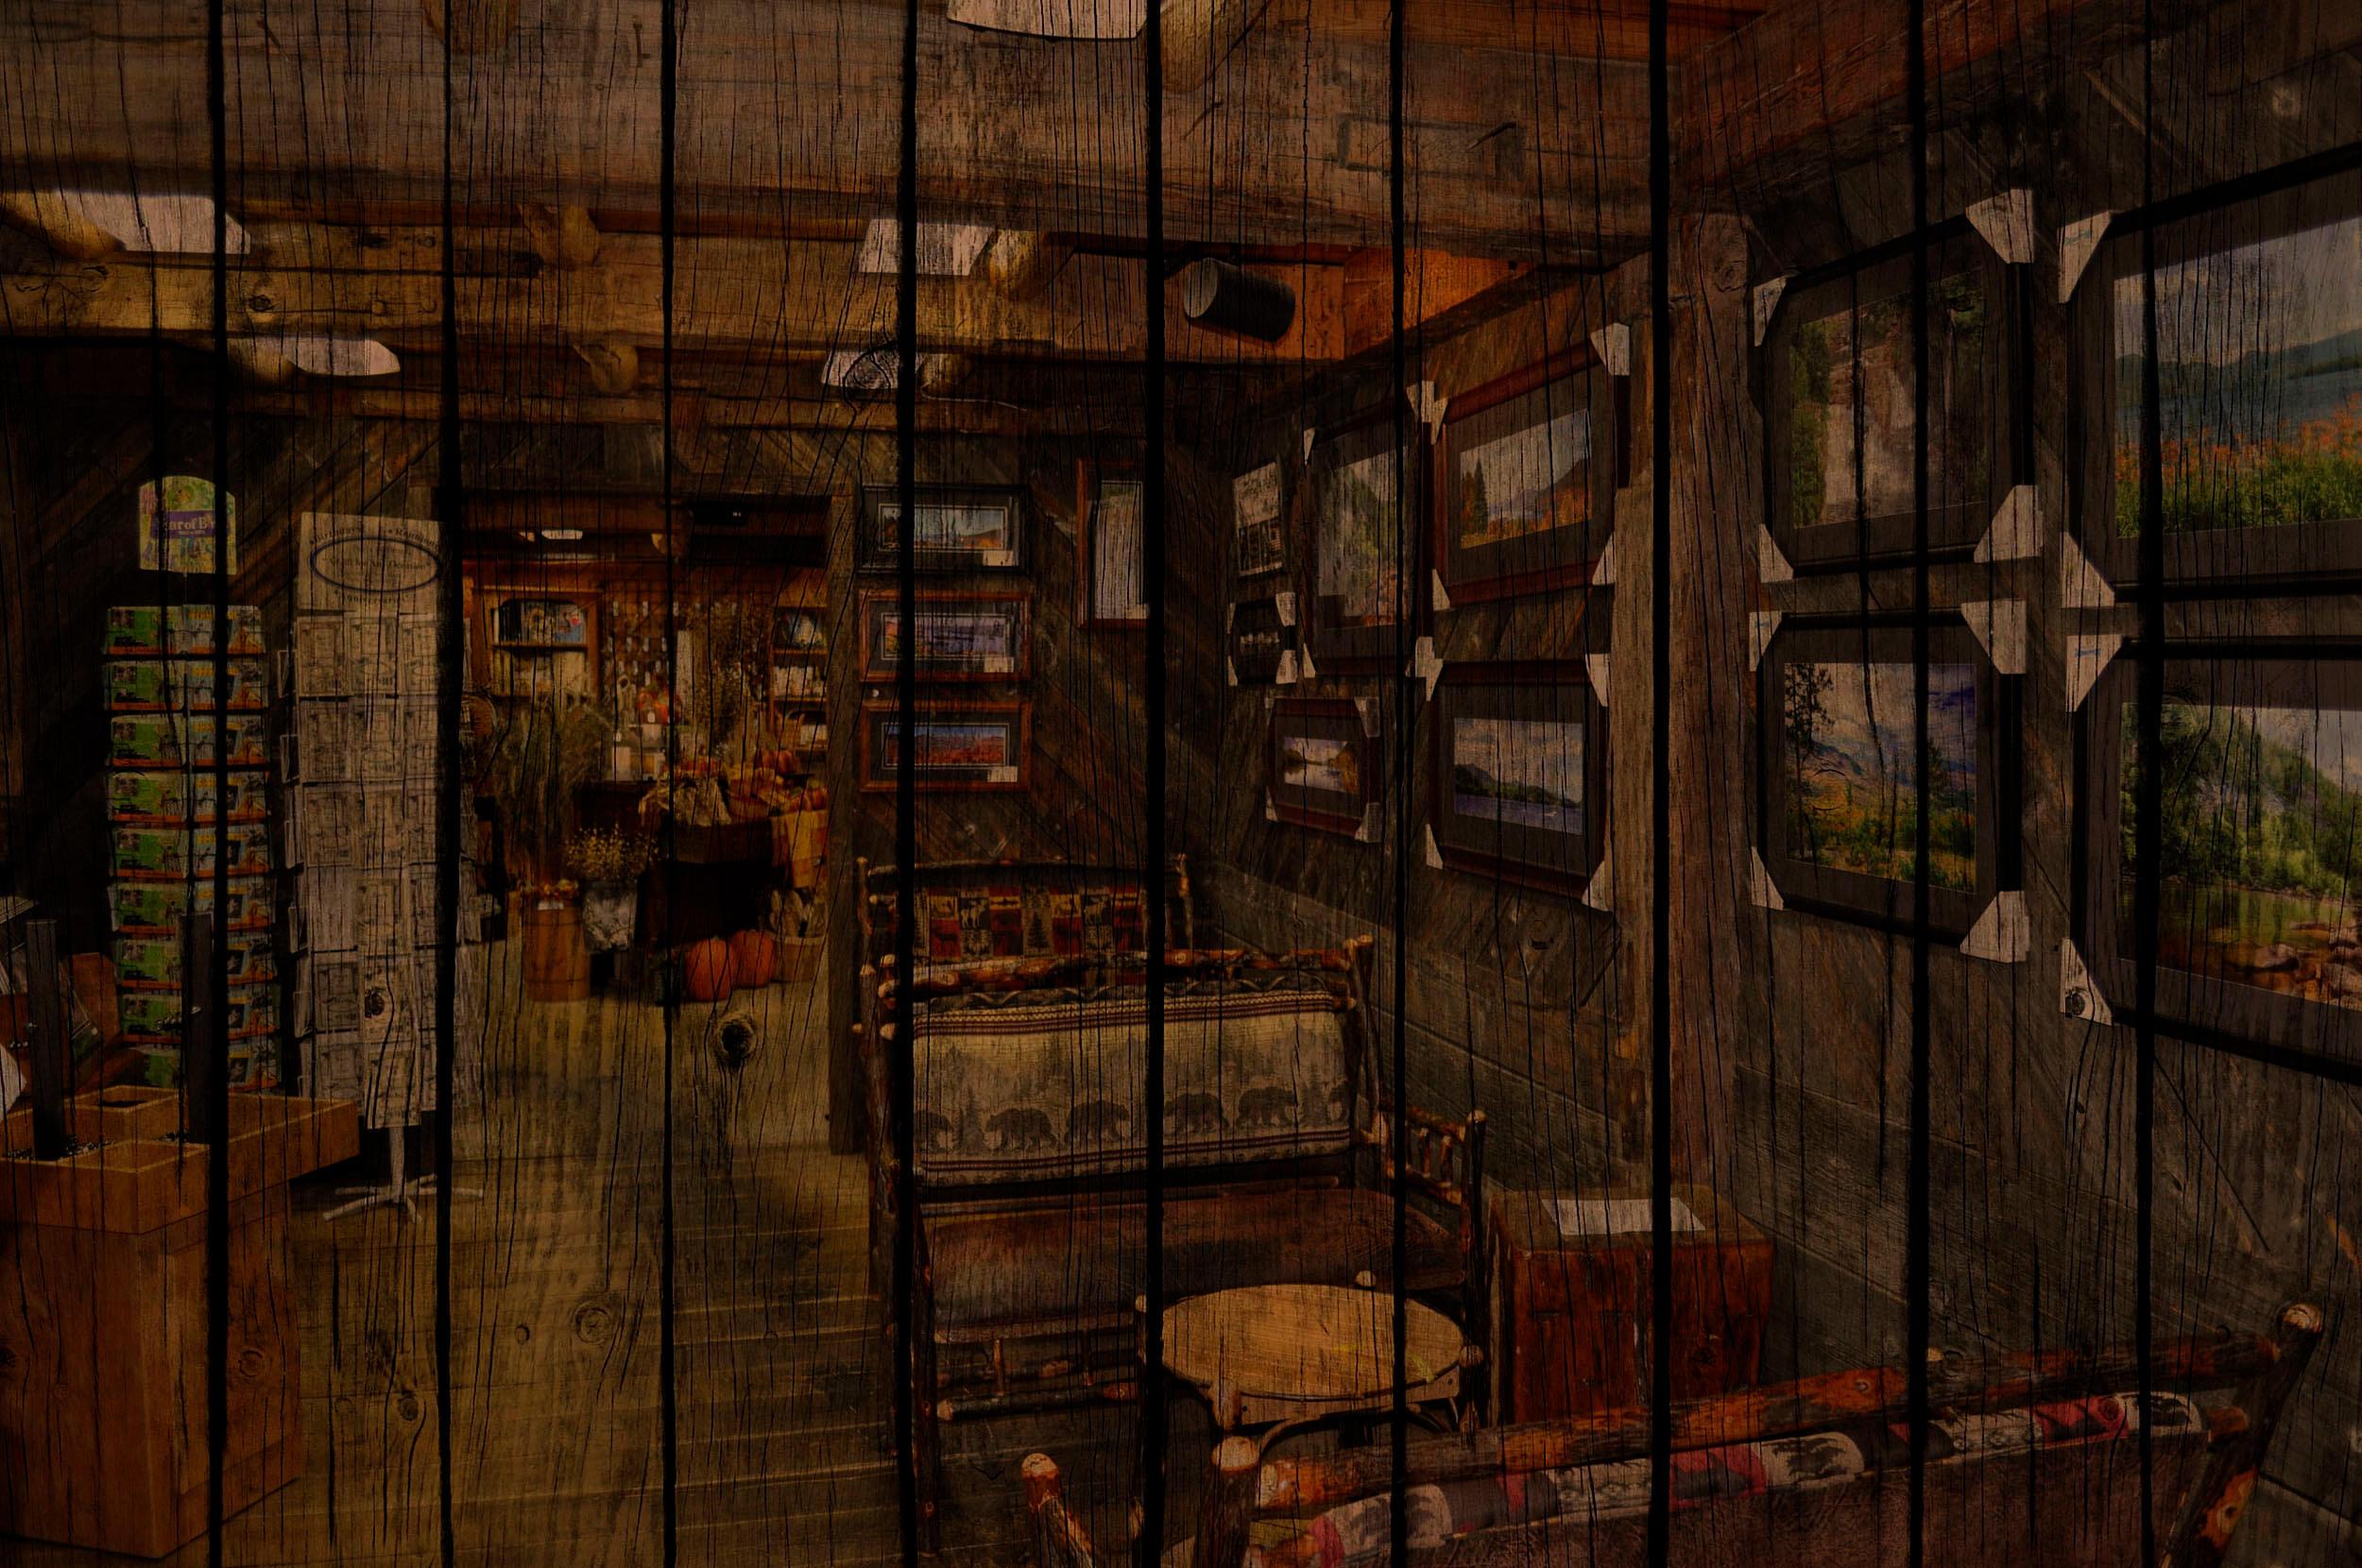 Silo Restaurant & Gift Shop image 7